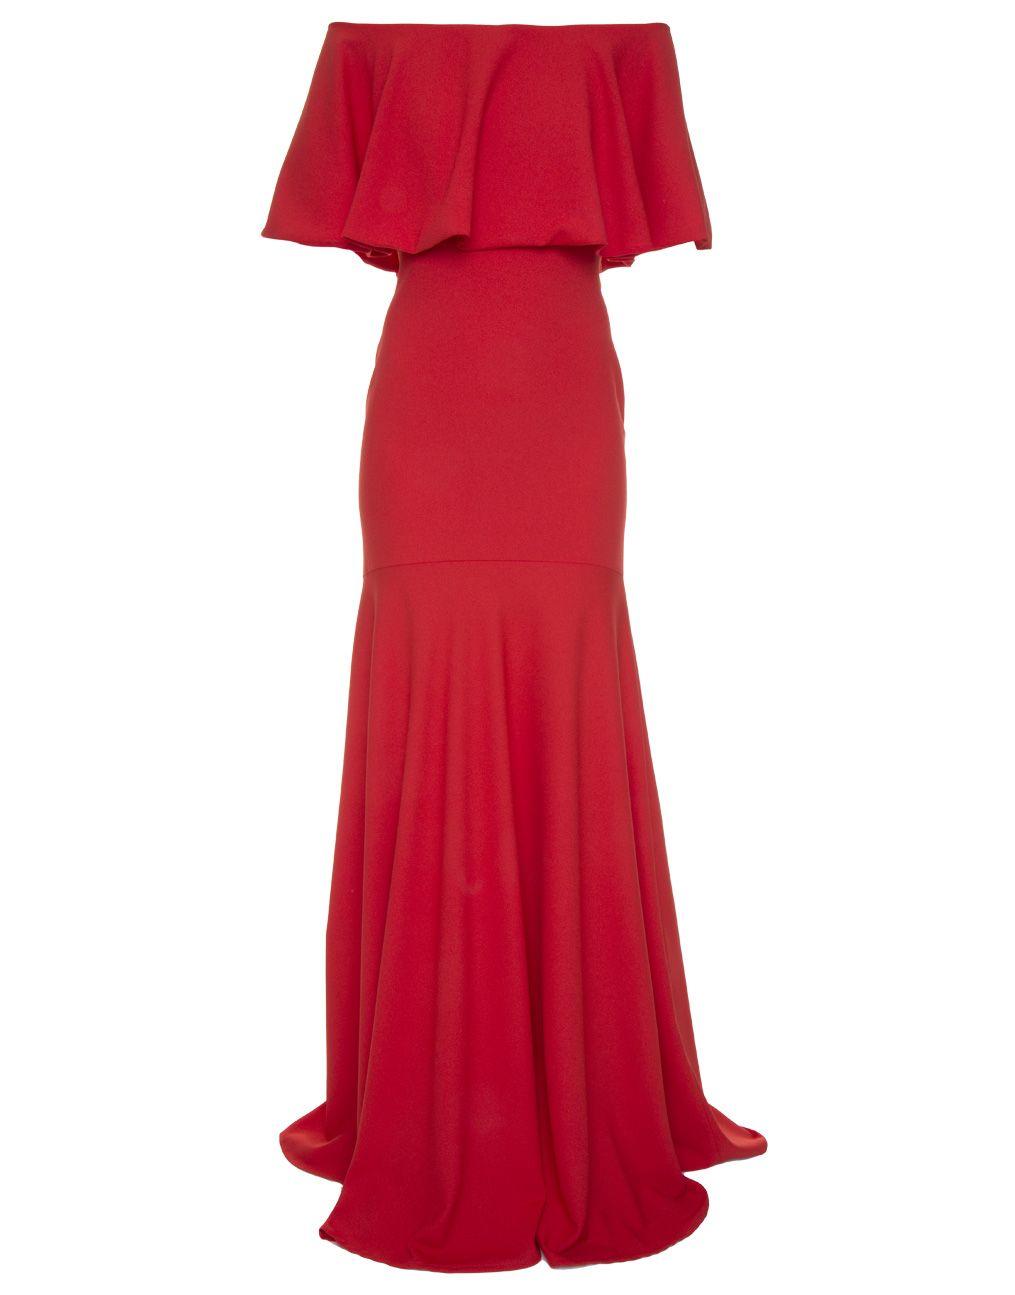 "Vestido longo vermelho com decote ombro a ombro Candy Brown por R$2.500 na <a href=""http://www.gallerist.com.br/vestido-longo-giulia-candy-brown-10398.aspx/p"" target=""blank_"">Gallerist</a>"